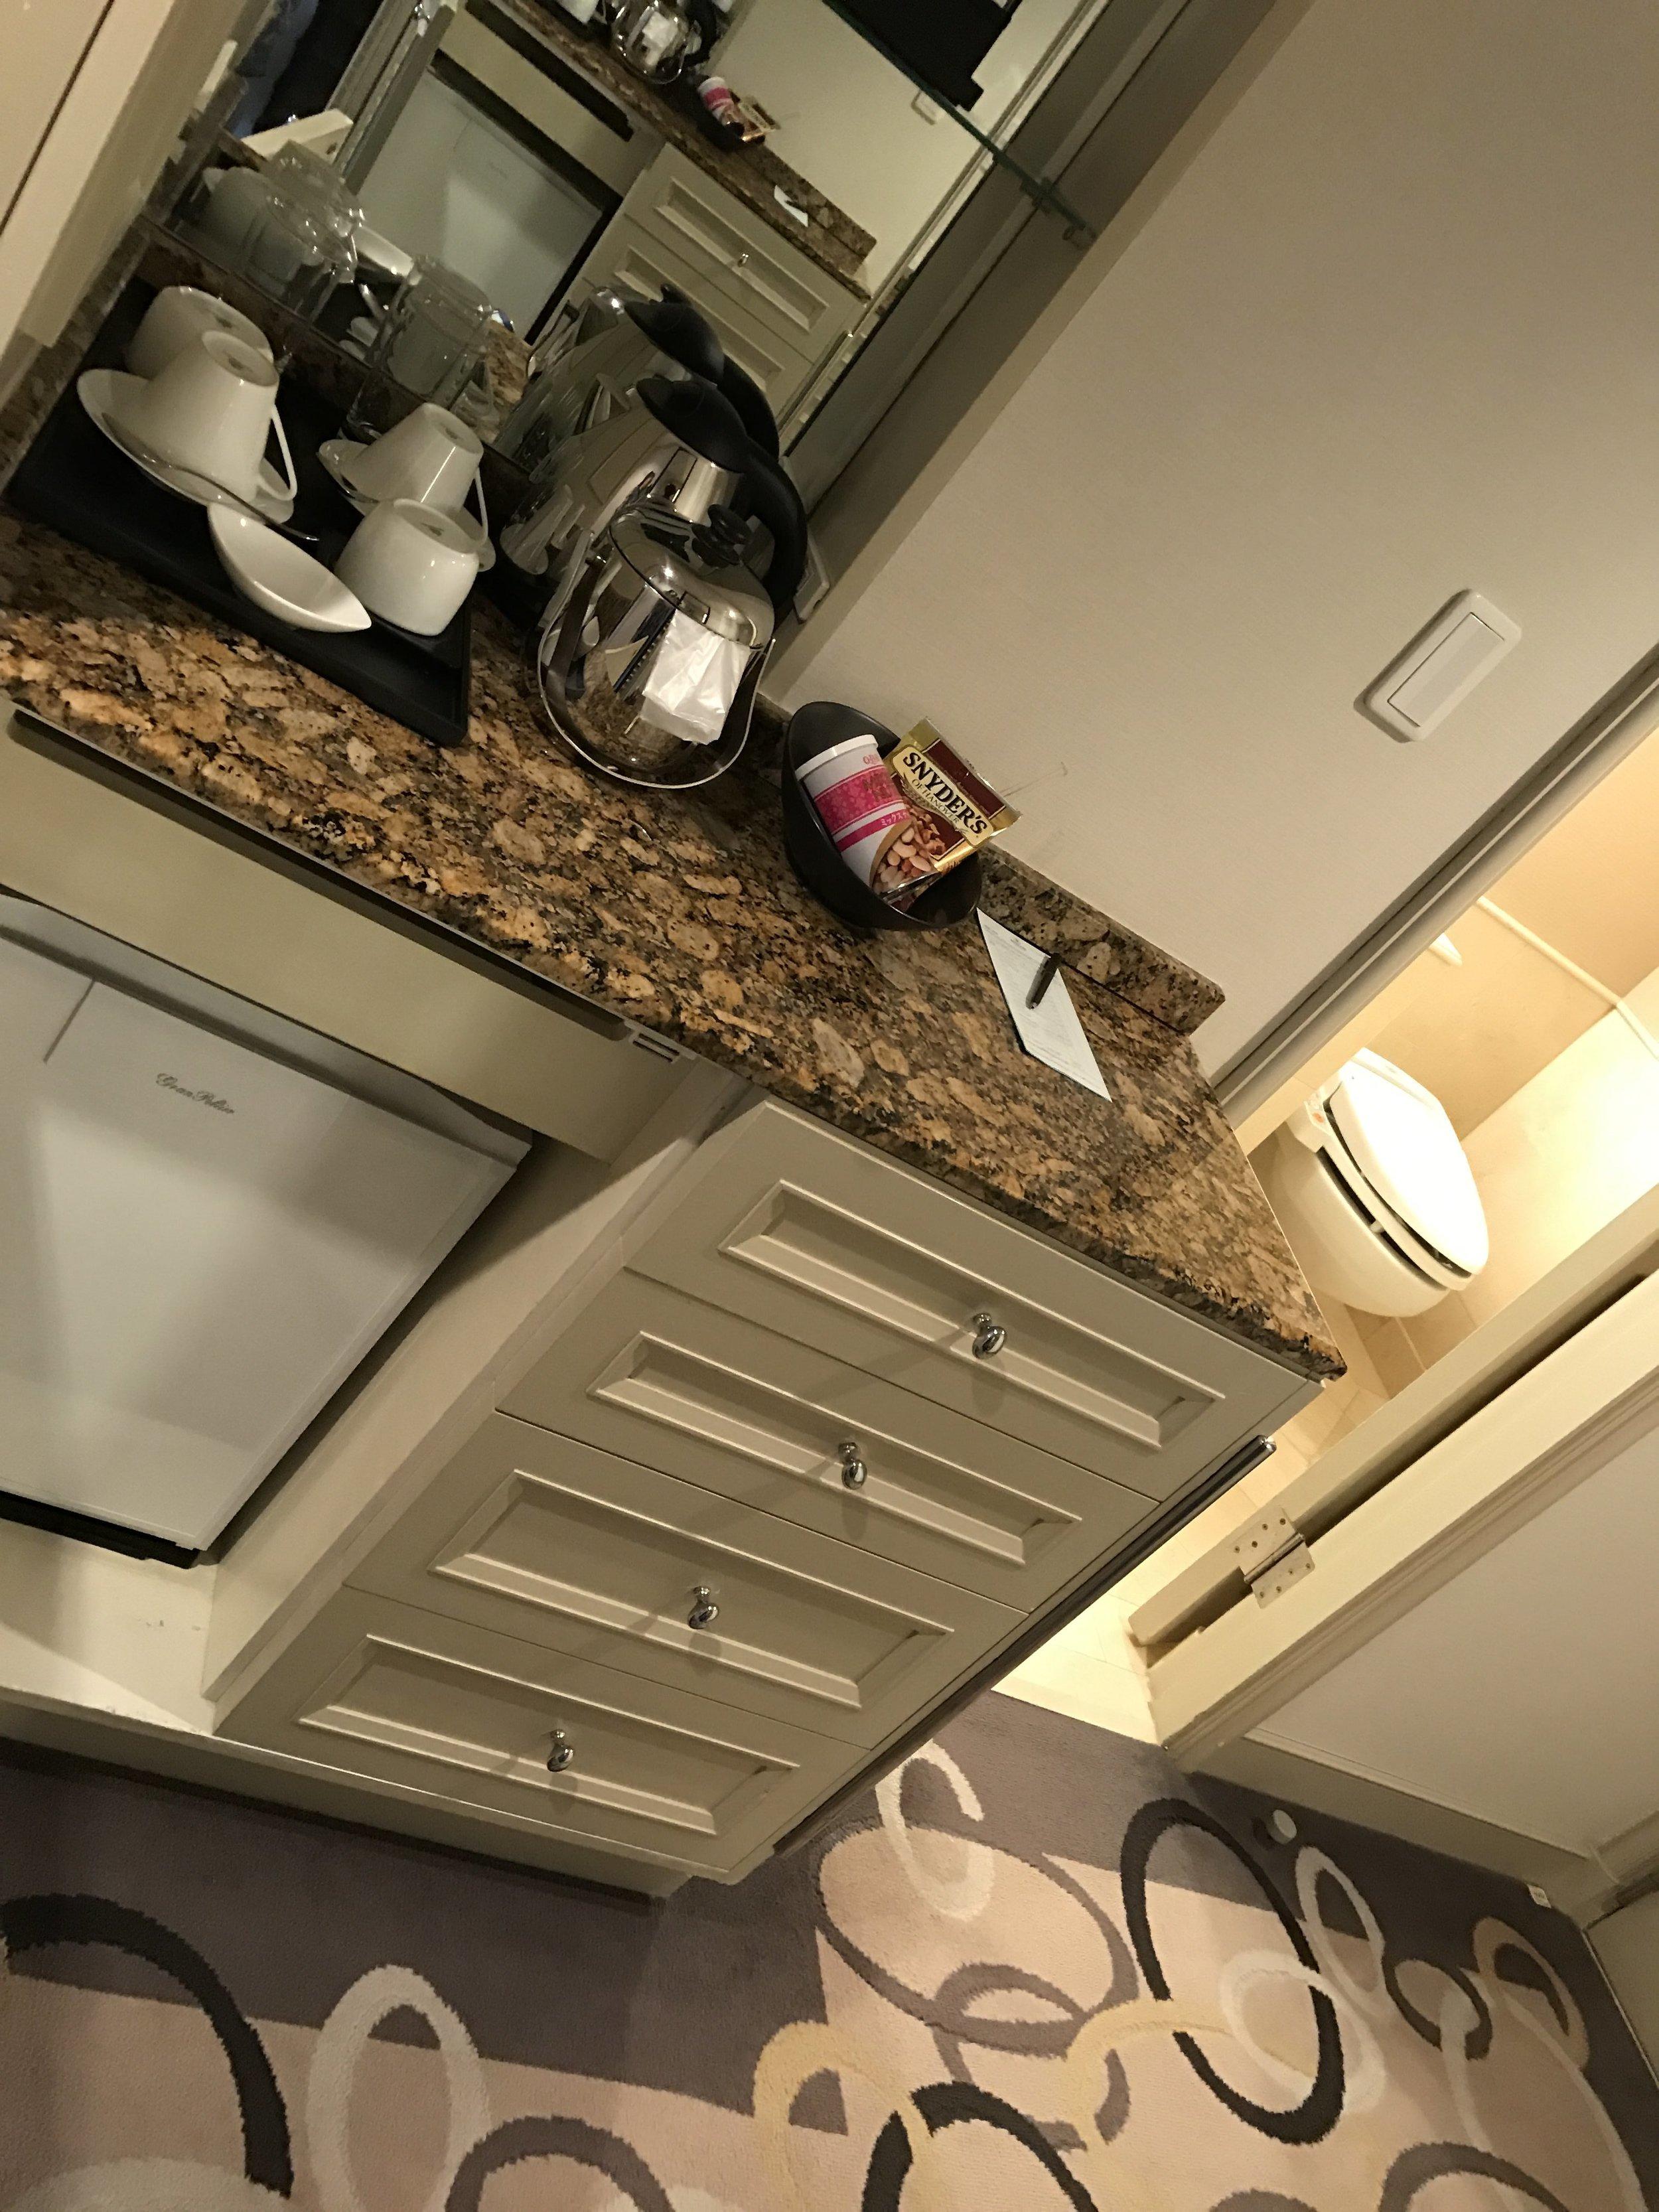 Hallway counter with coffee and tea maker and mini fridge